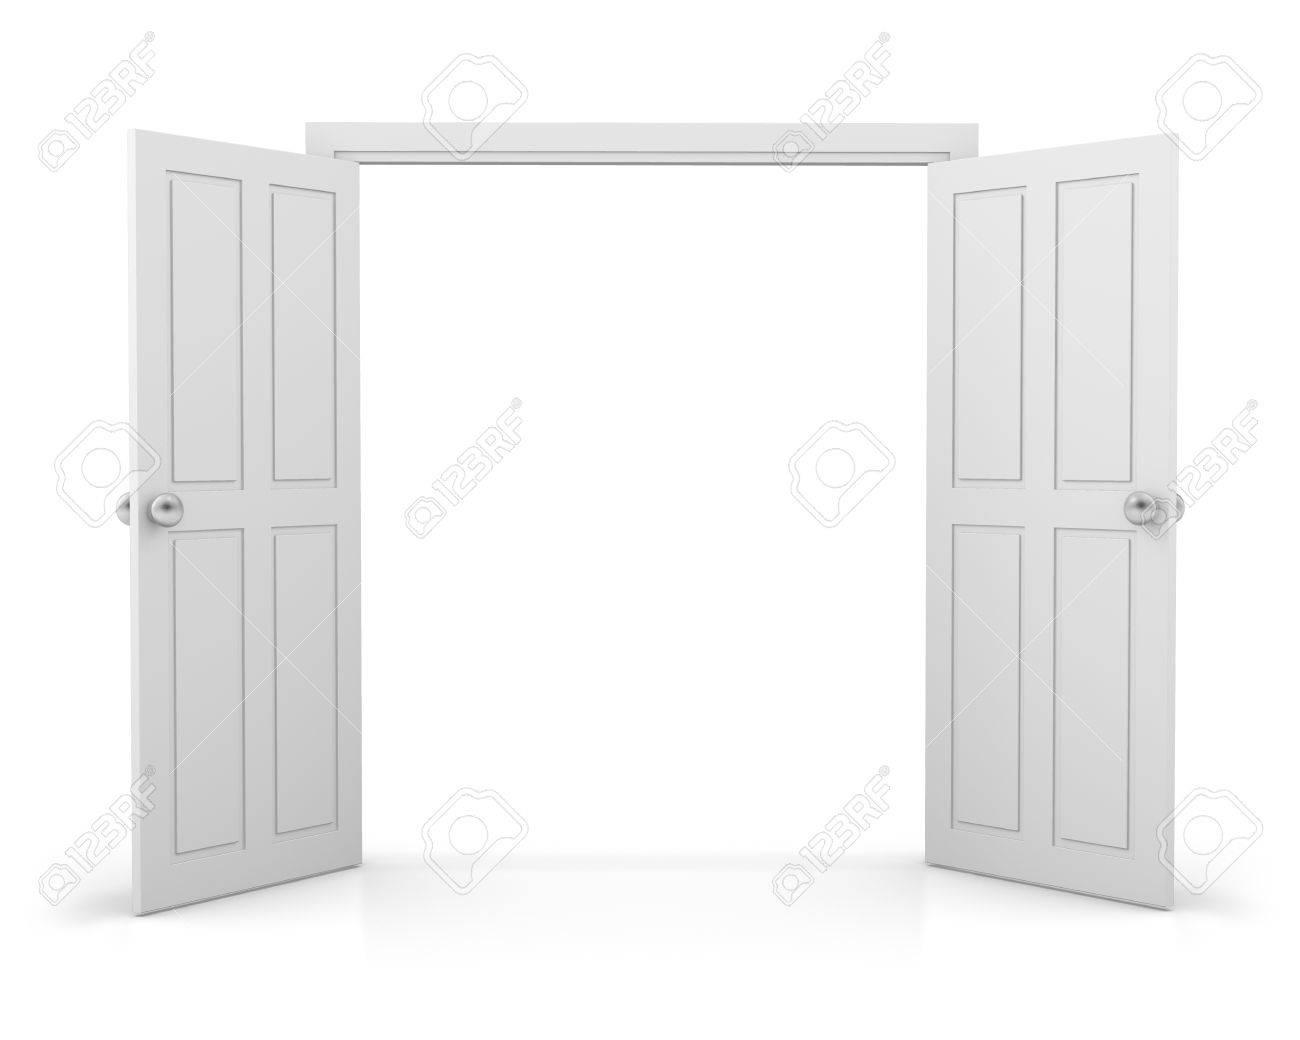 white double door. 3d White Double Door On Background Stock Photo - 53249405